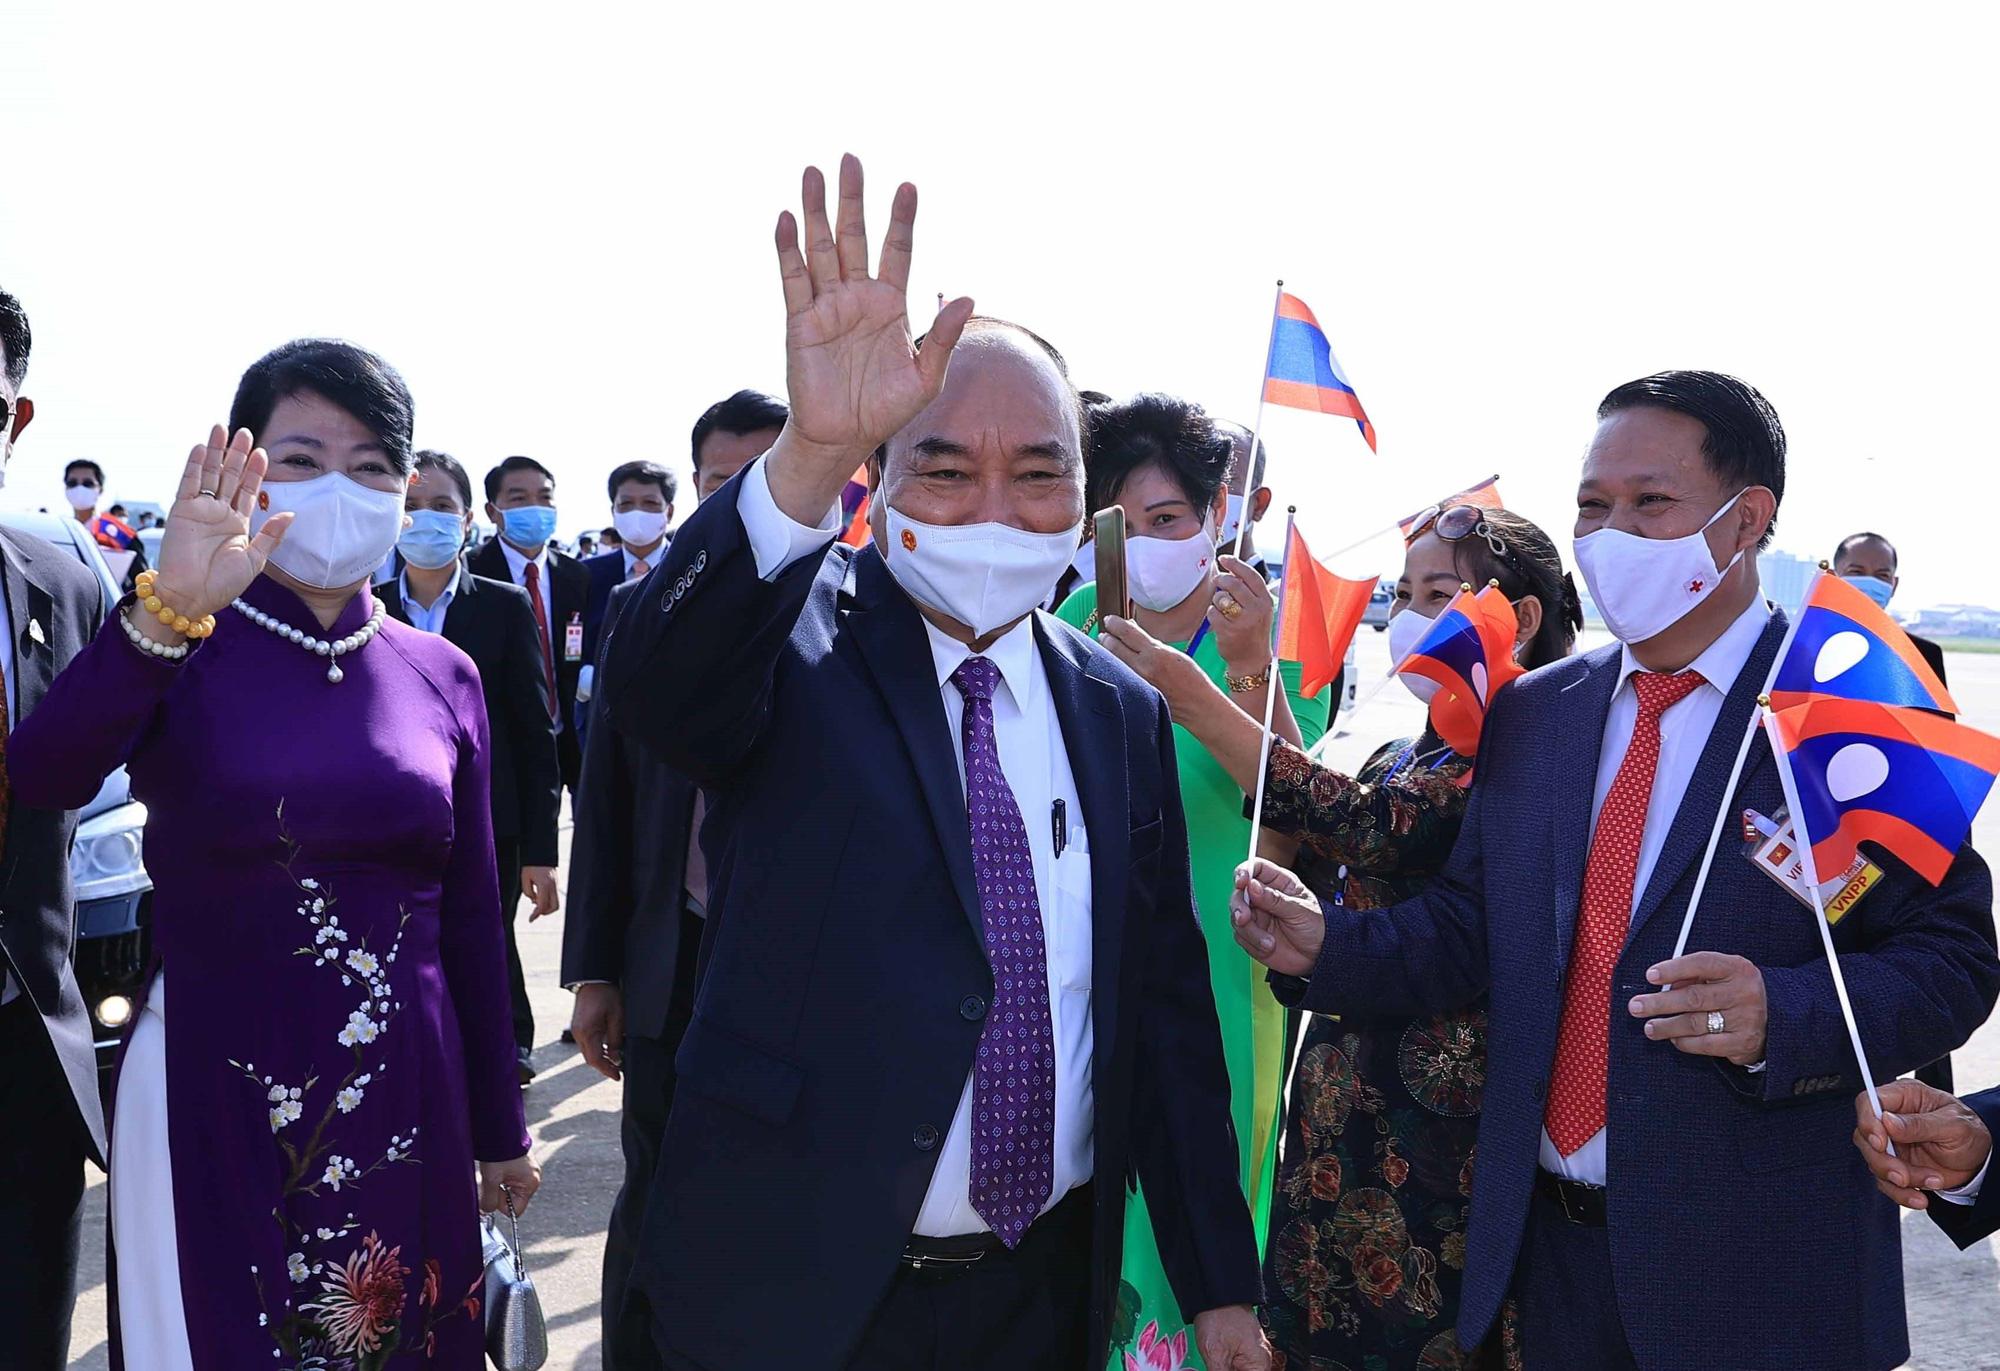 Vietnam president arrives in Laos for official visit